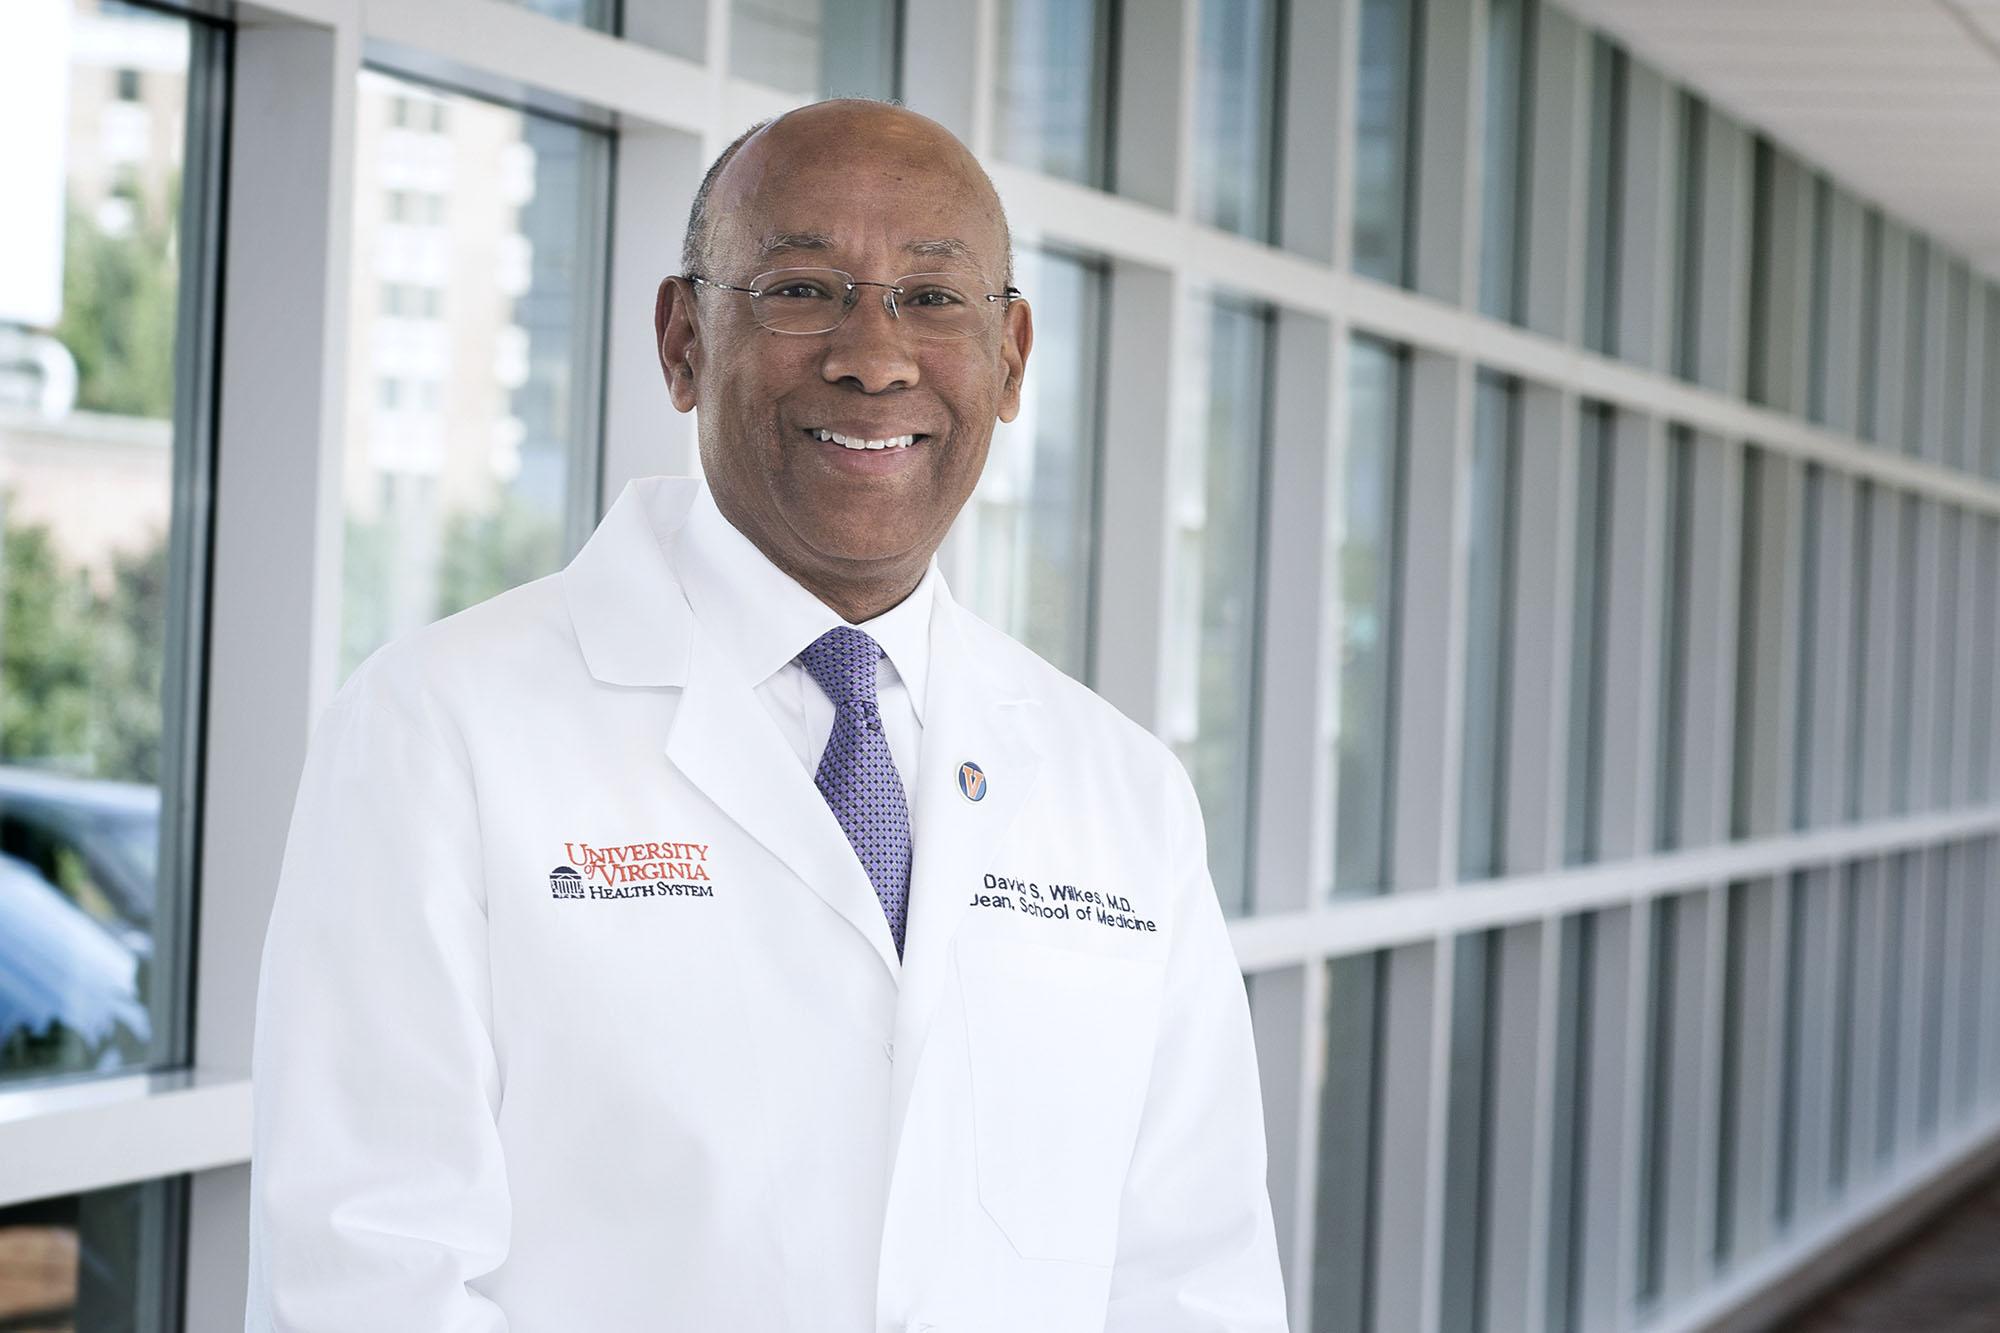 UVA's David S. Wilkes Elected to Prestigious National Academy of Medicine